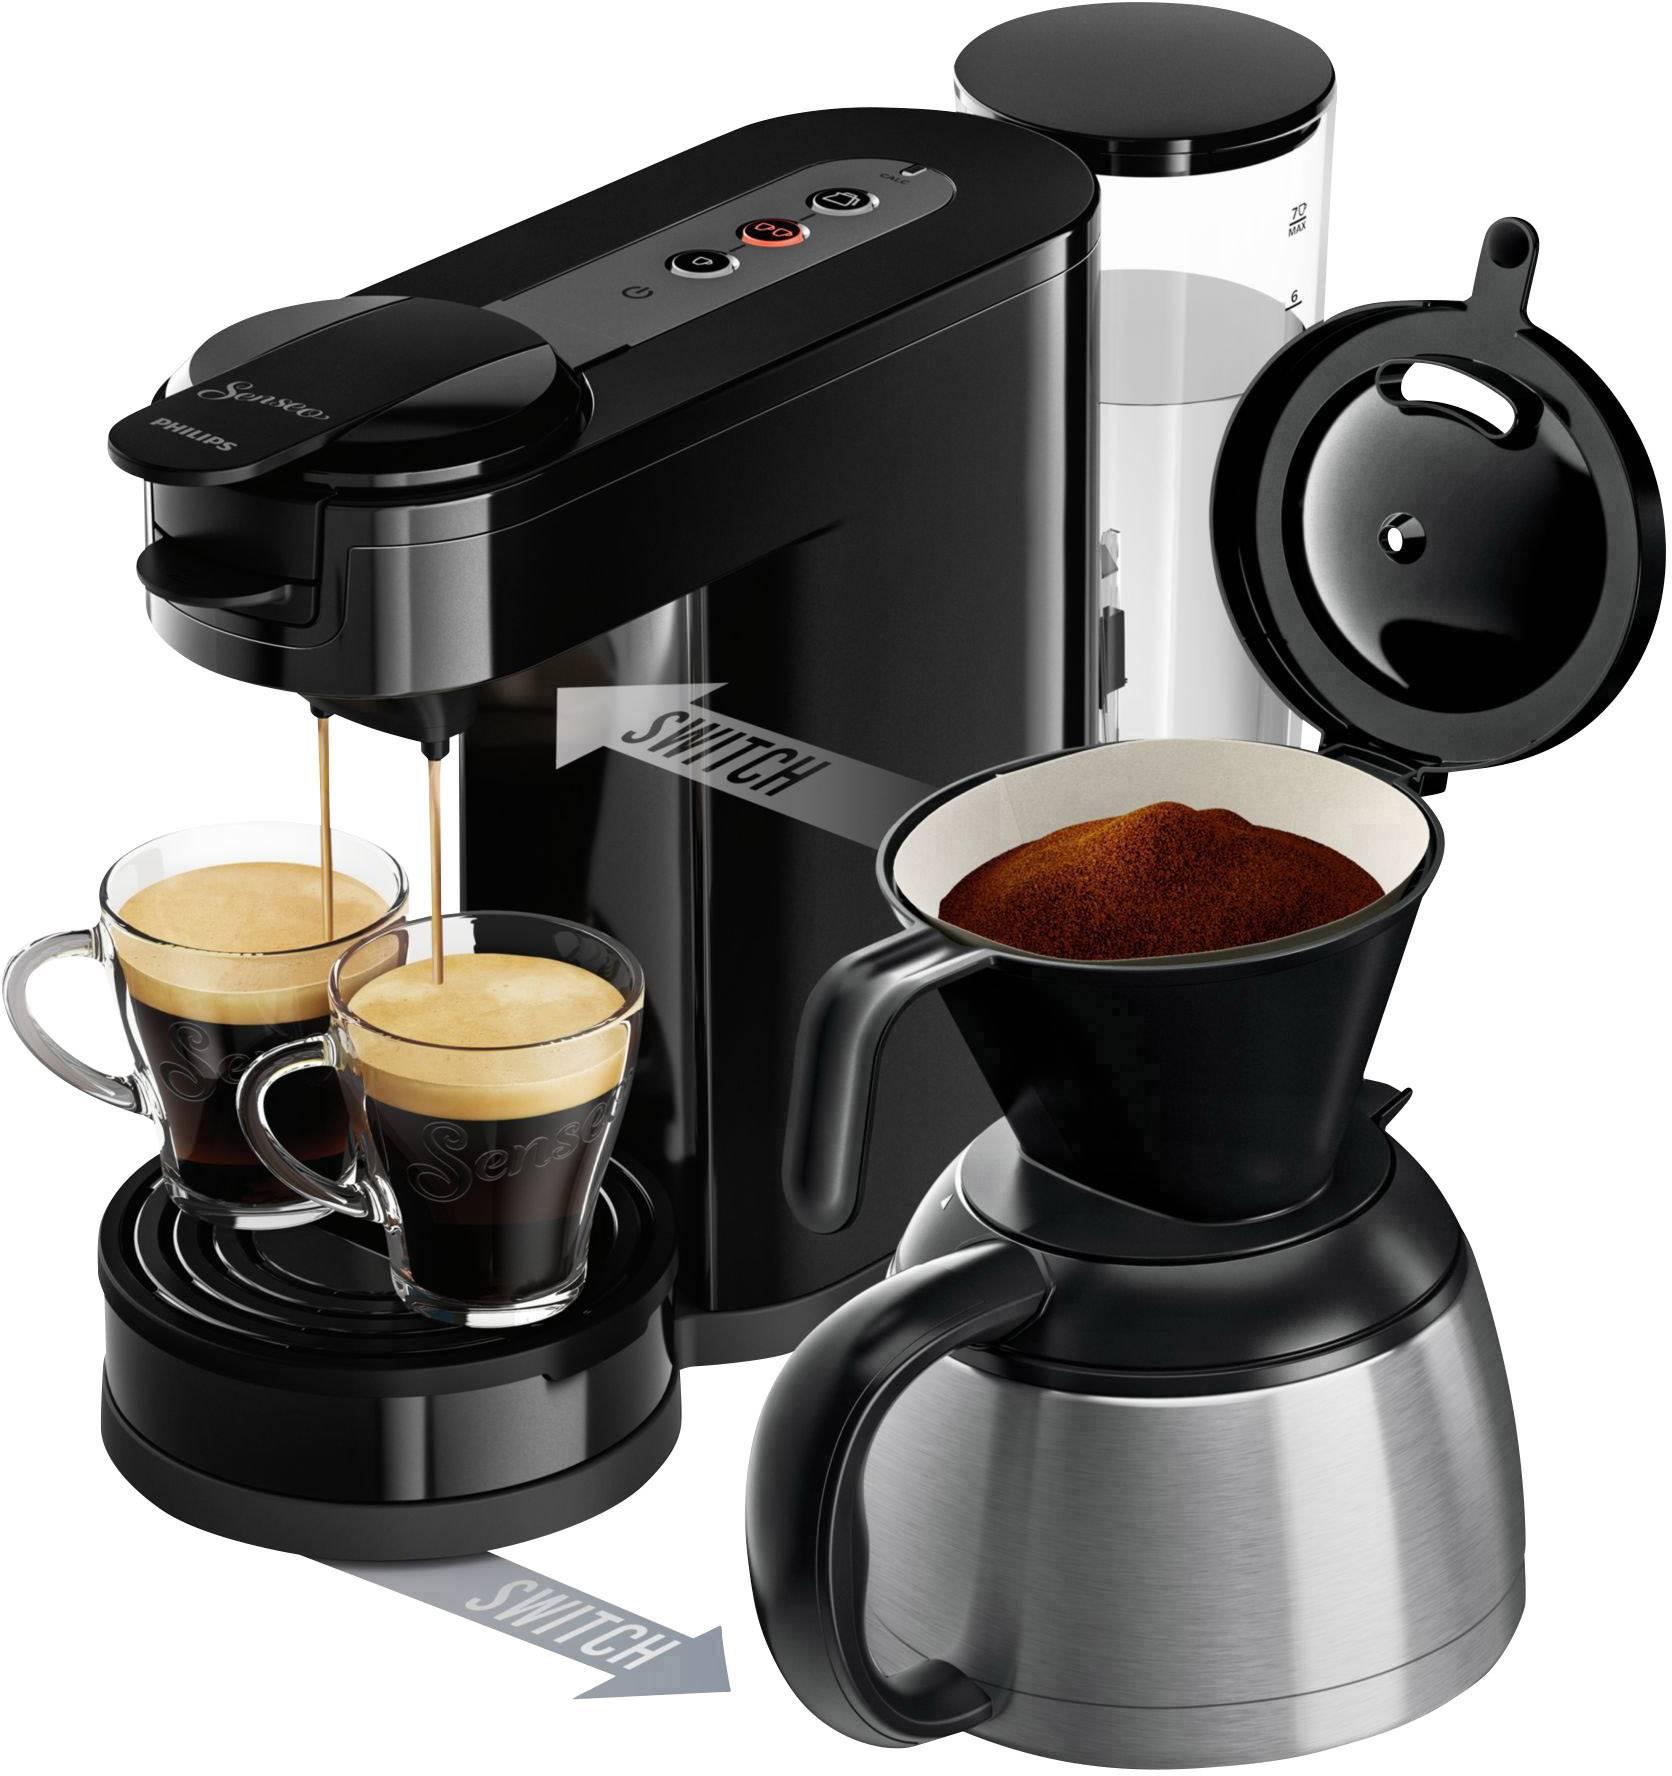 Senseo Switch Hd789260 Hd789260 Pod Coffee Machine Black